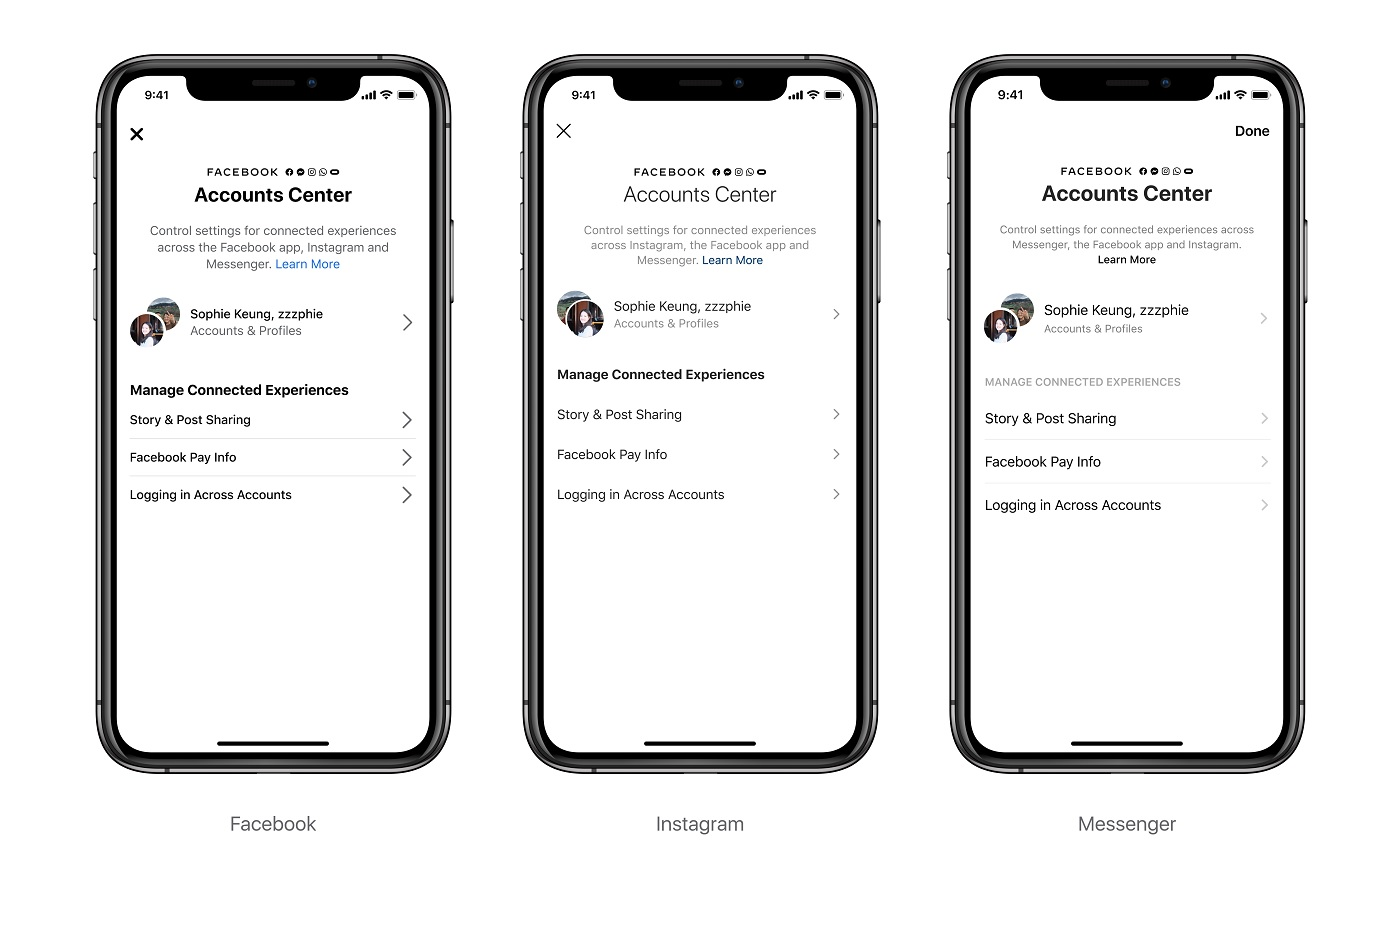 Account Center sur Facebook, Messenger et Instagram